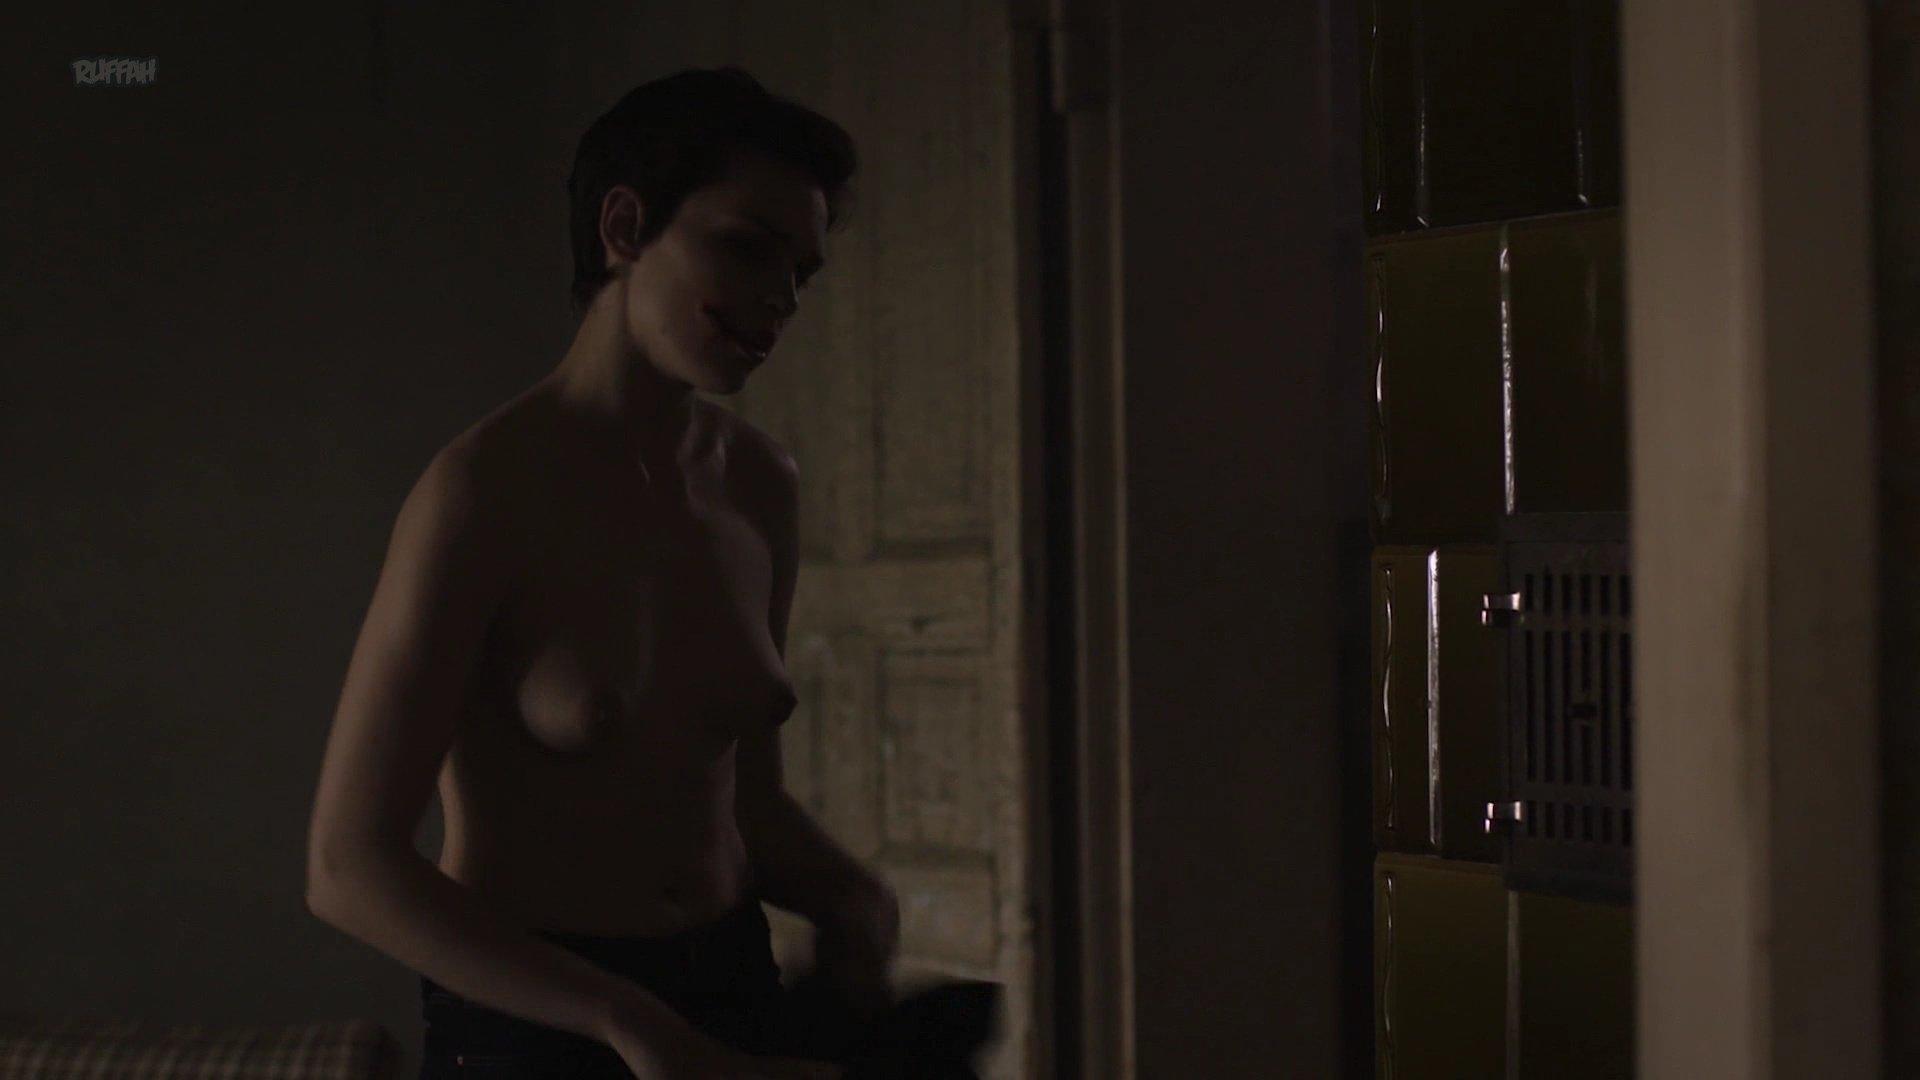 Sara Serraiocco nude - Counterpart s01e02 (2018)